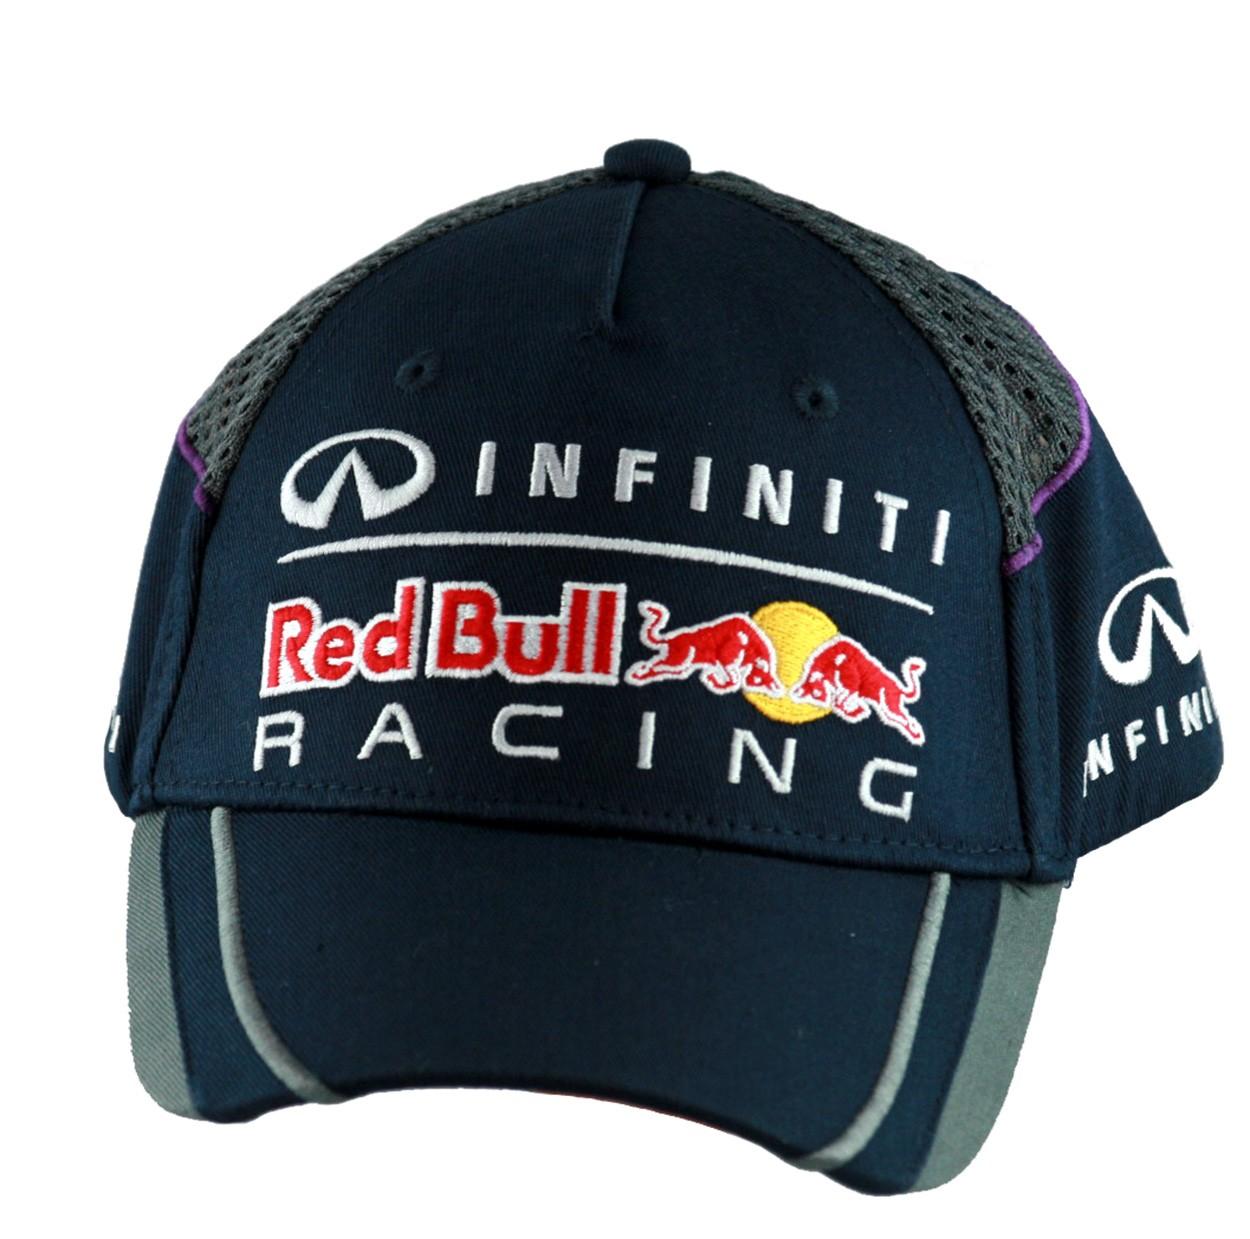 pepe jeans pm040277 teamline cap red bull infinity racing. Black Bedroom Furniture Sets. Home Design Ideas